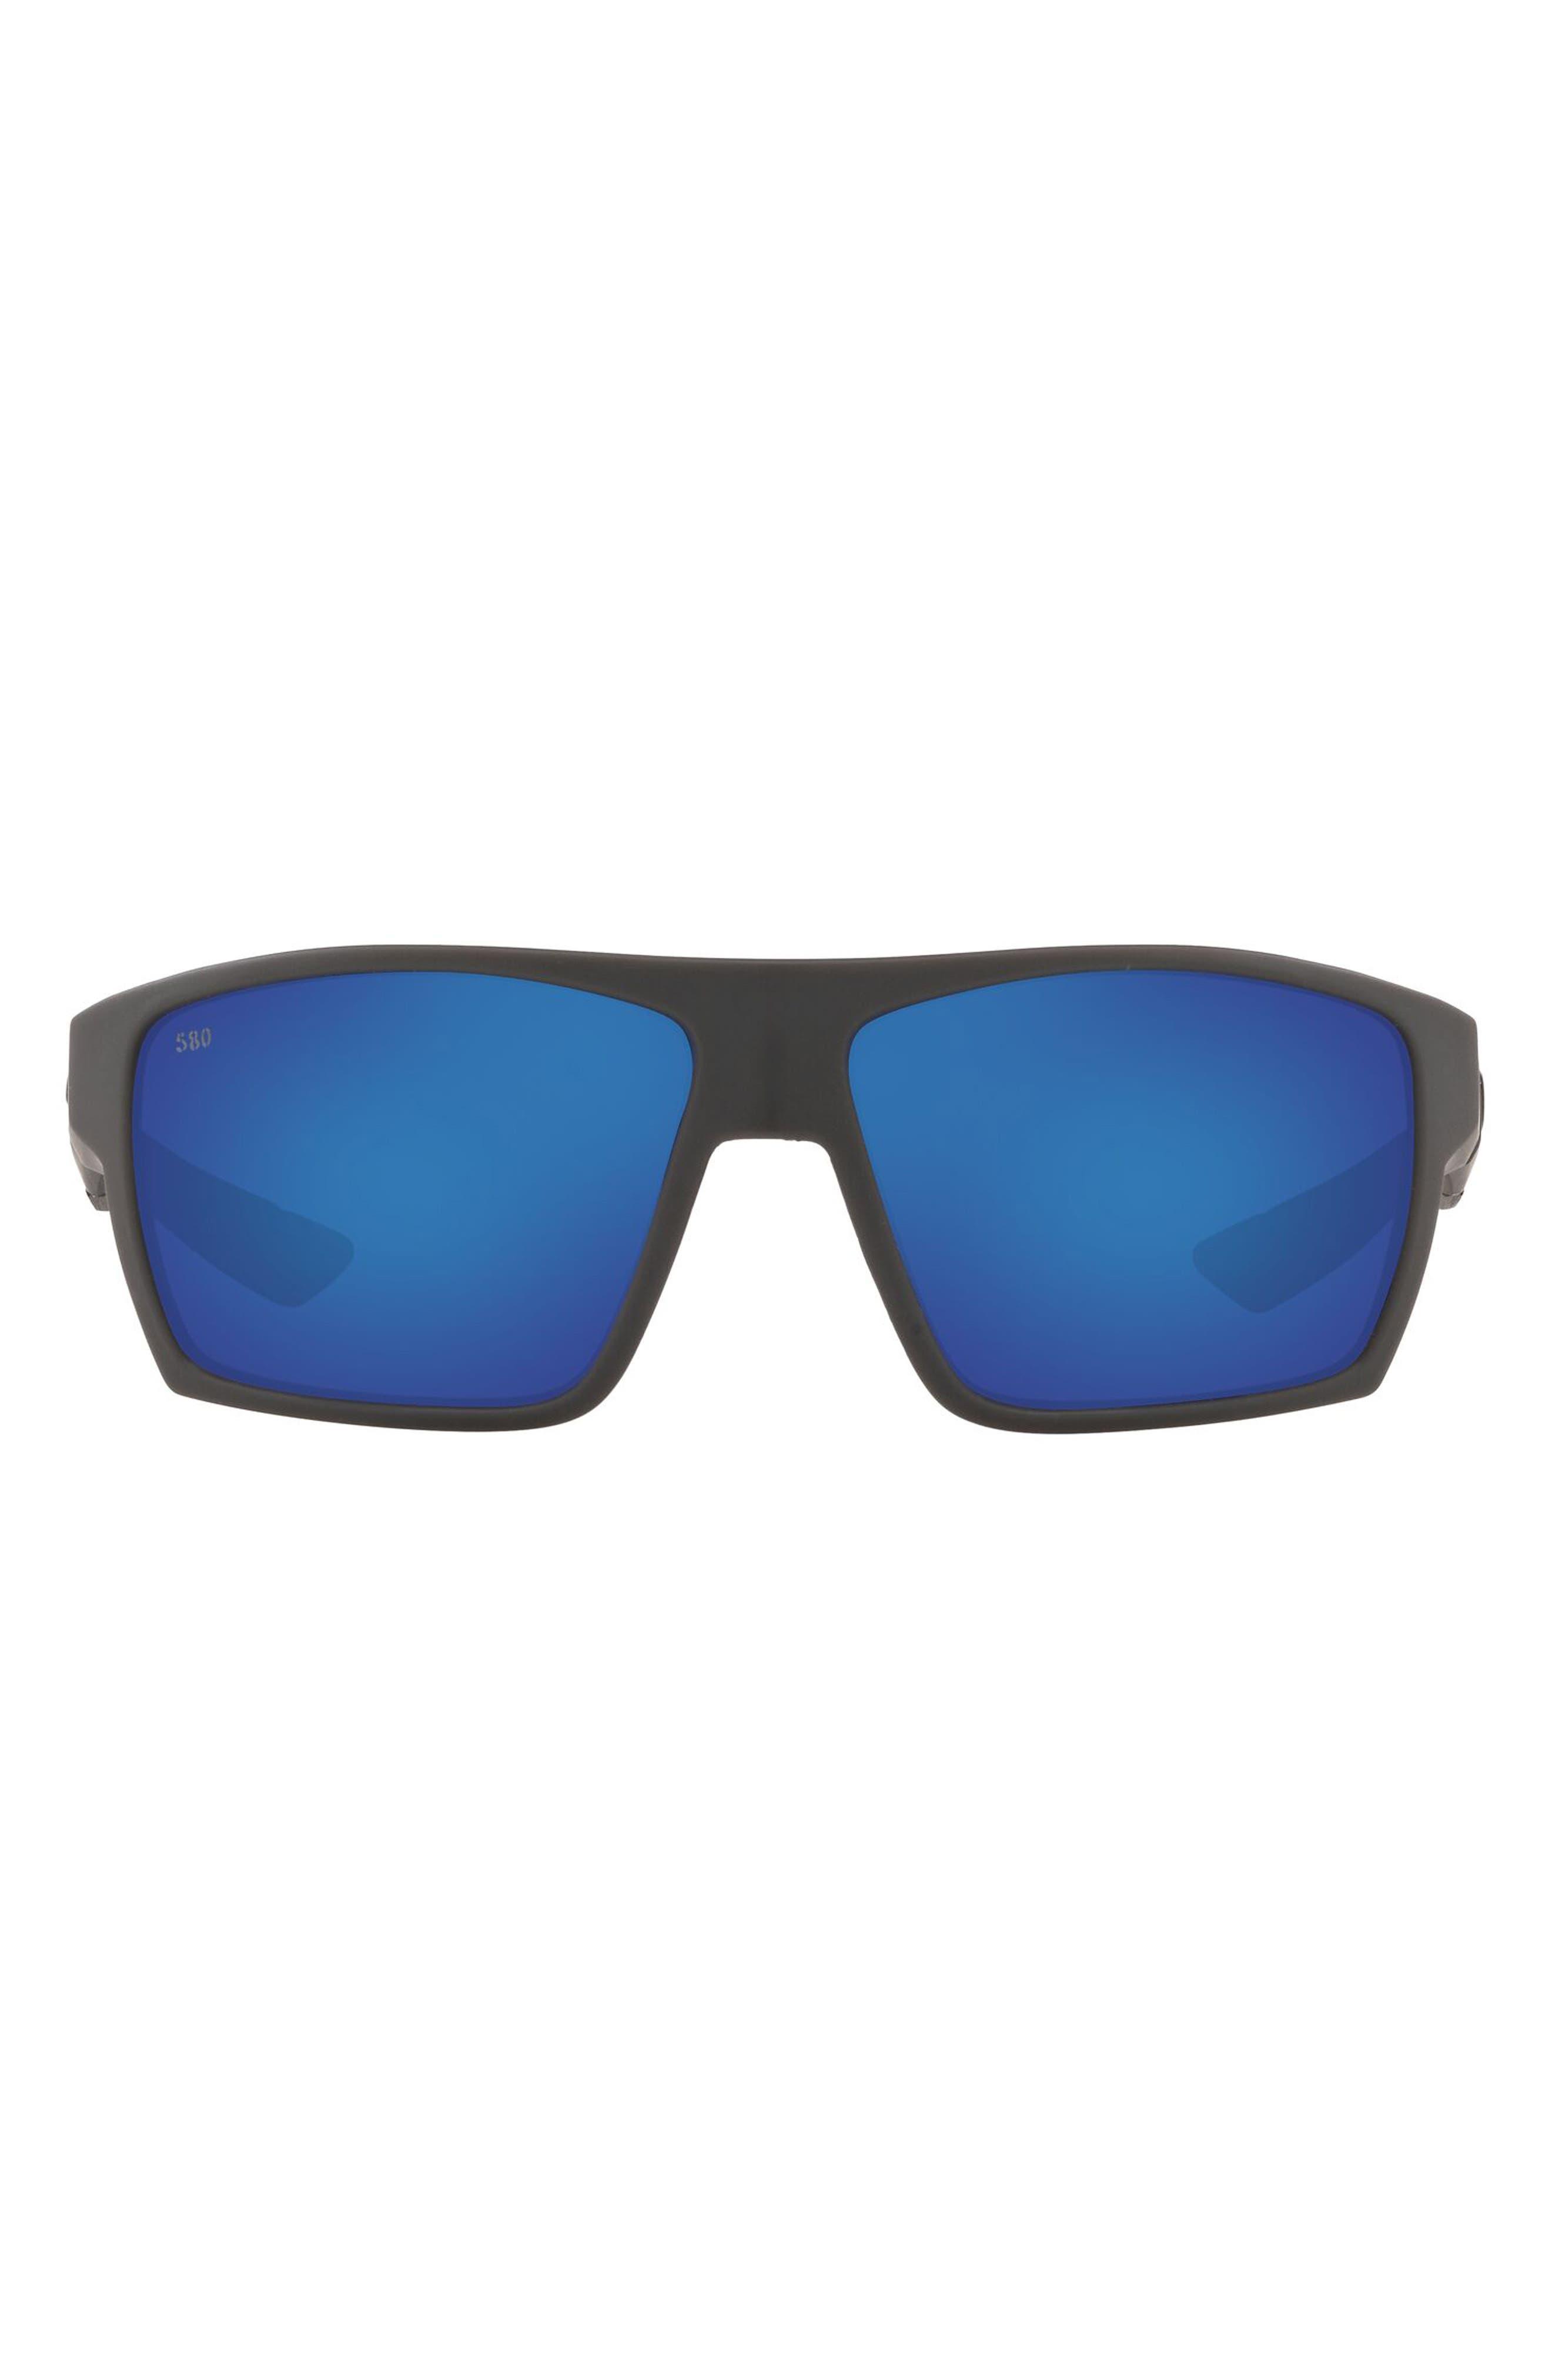 61mm Polarized Square Sunglasses